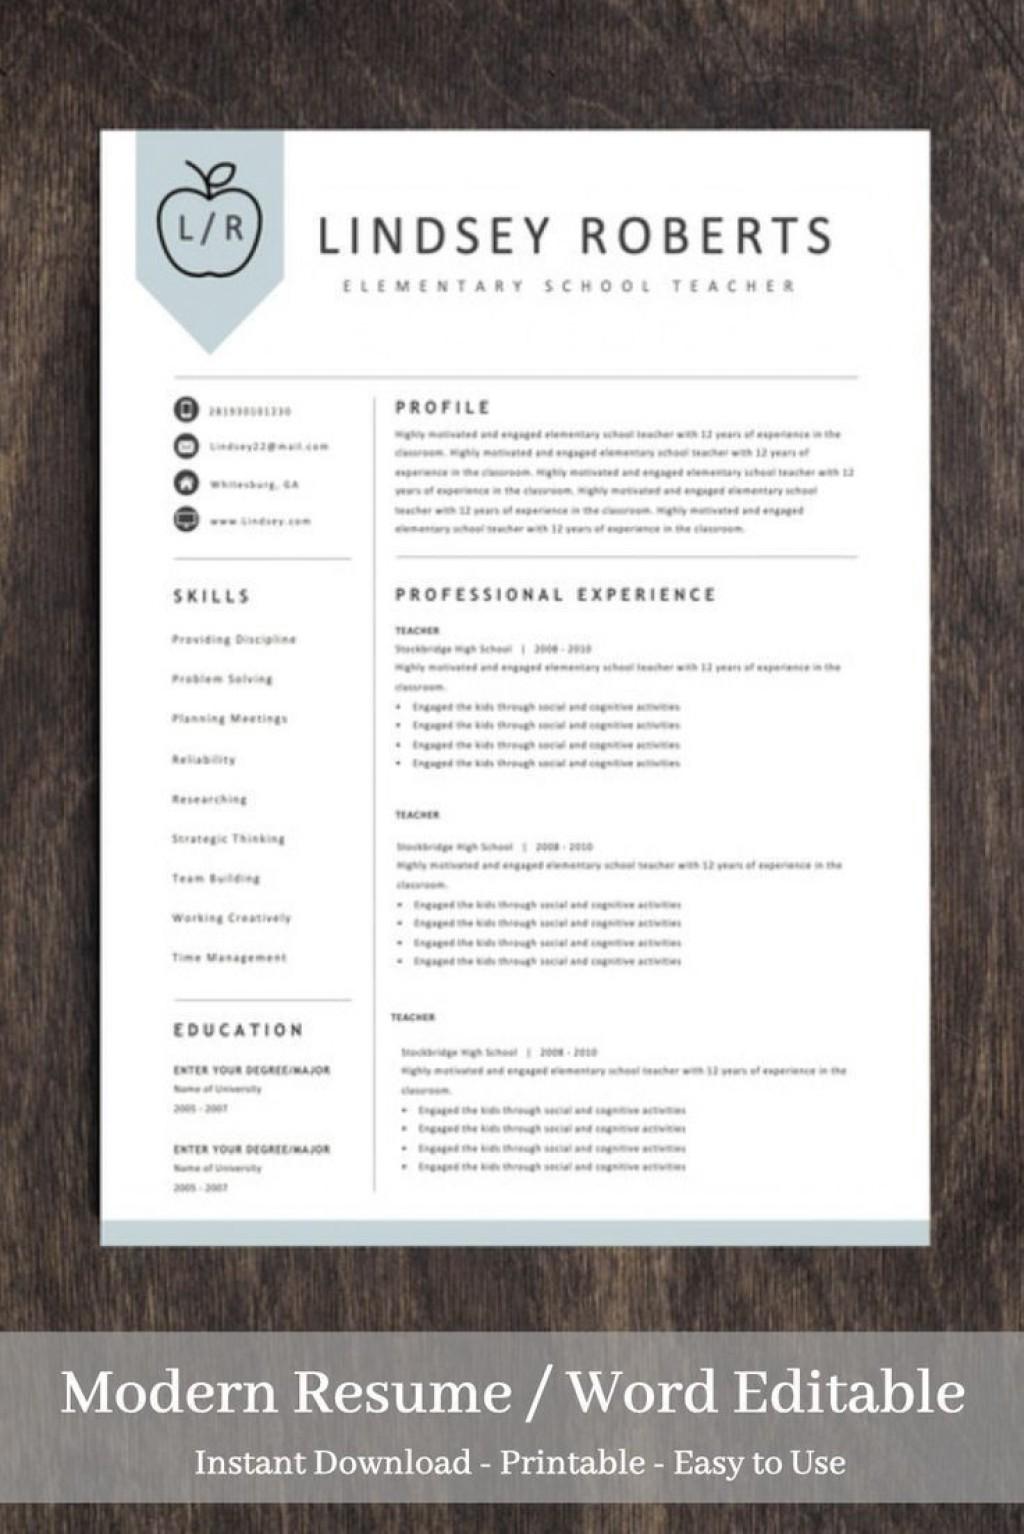 004 Sensational Teacher Resume Sample Free Download Idea  CvLarge